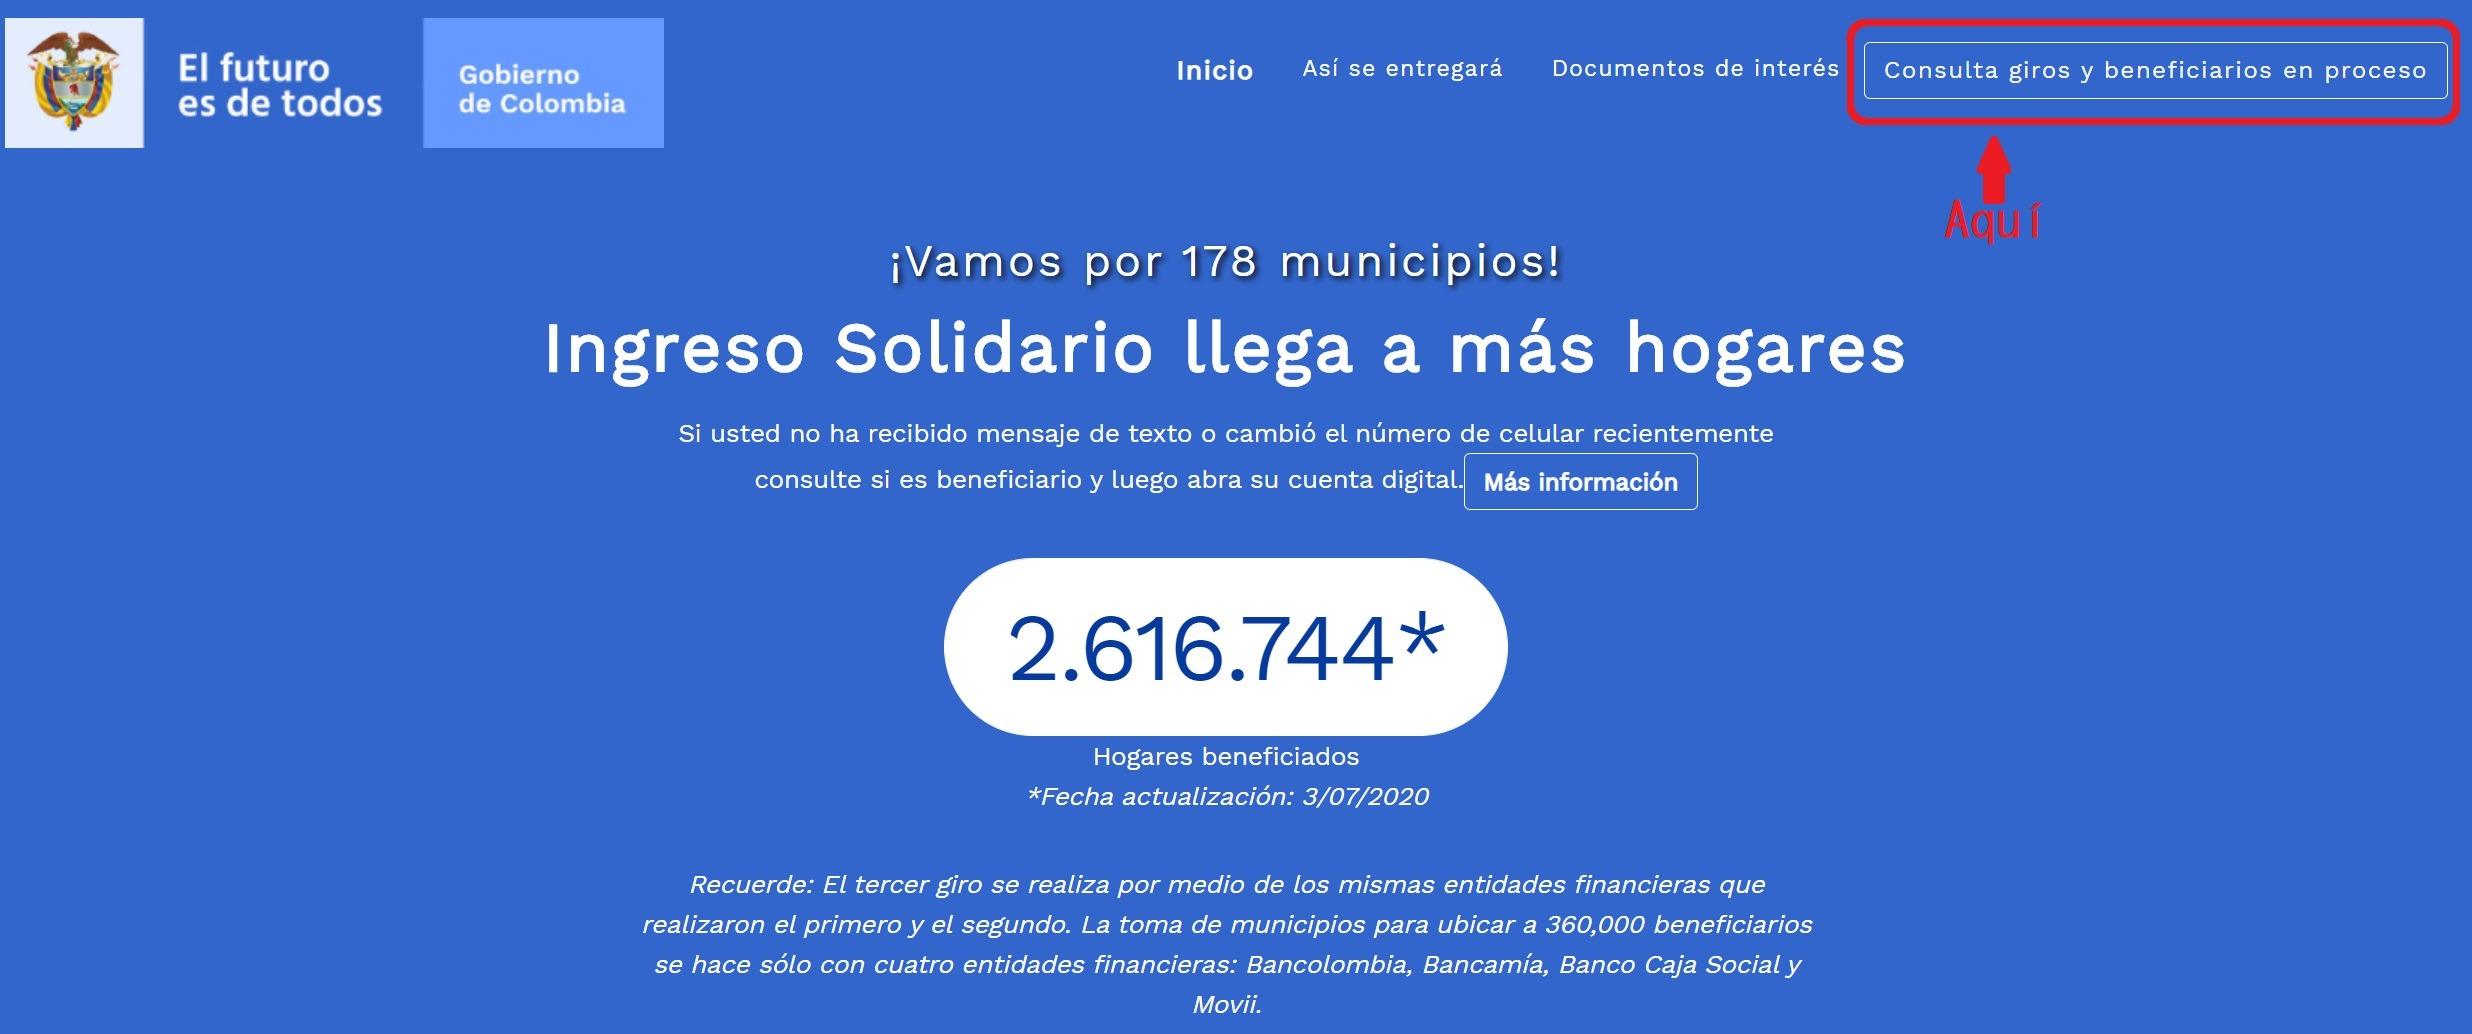 ingreso solidario consulta beneficiarios